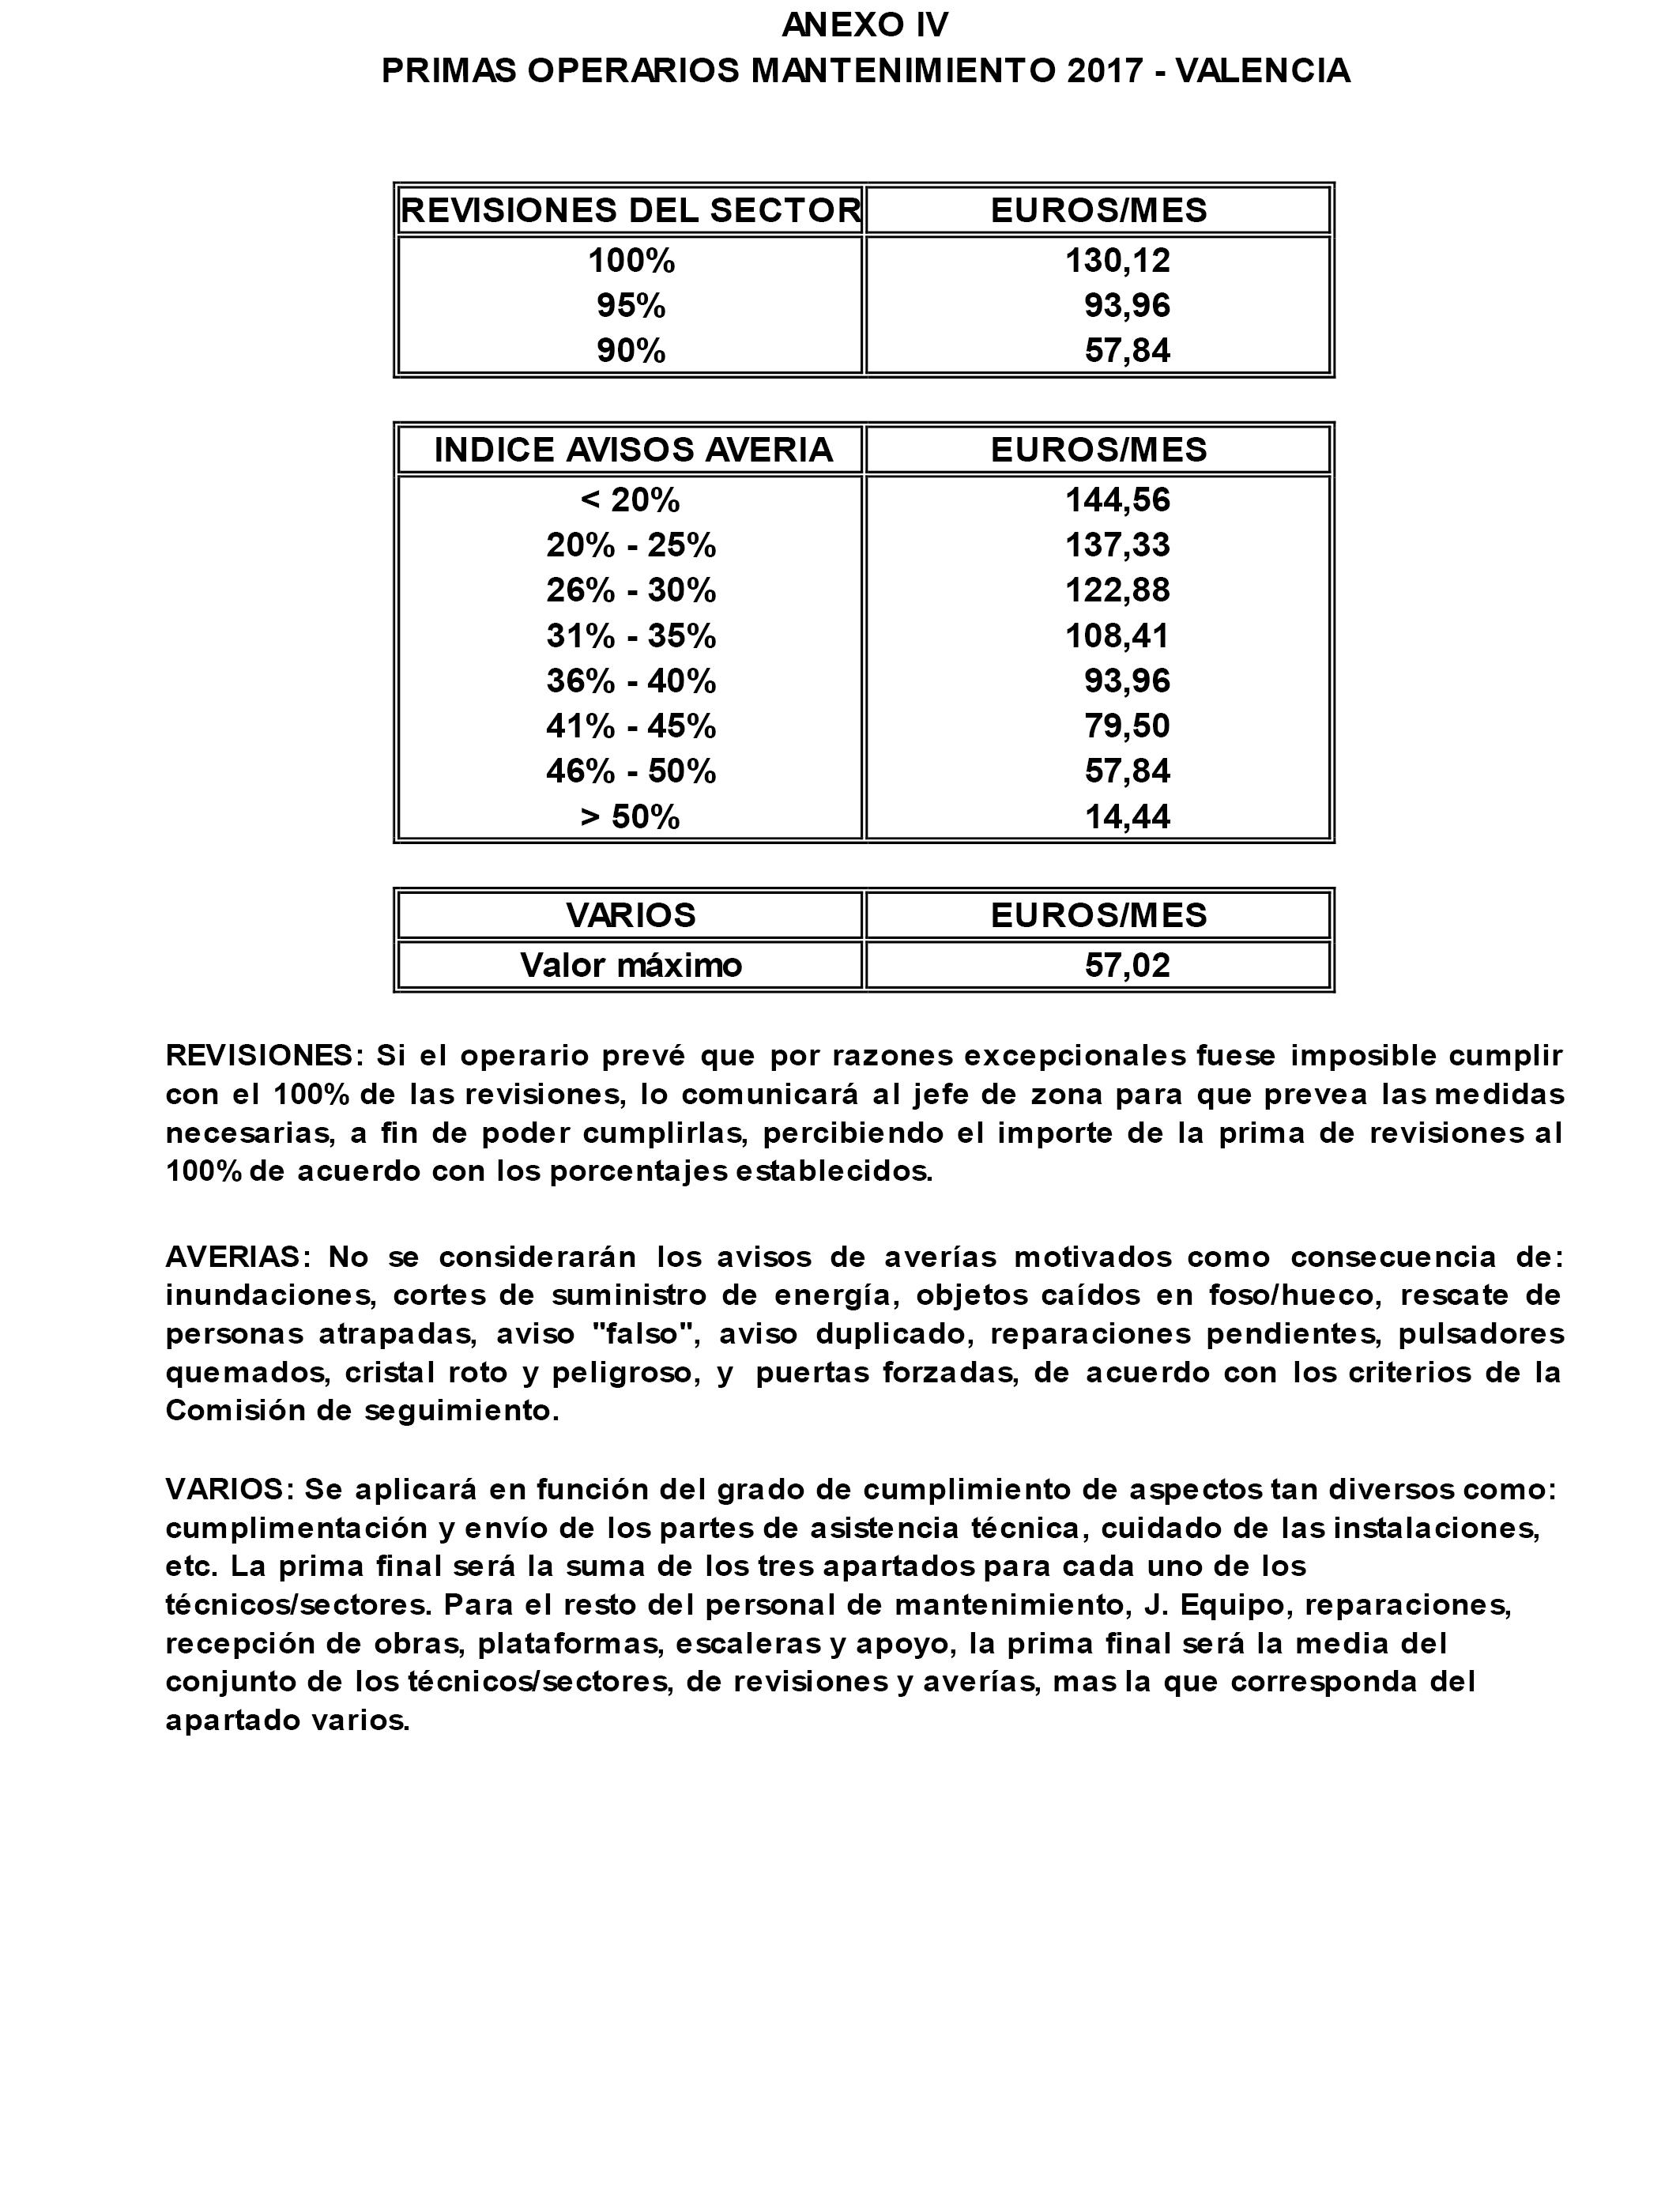 BOE.es - Documento BOE-A-2018-3153